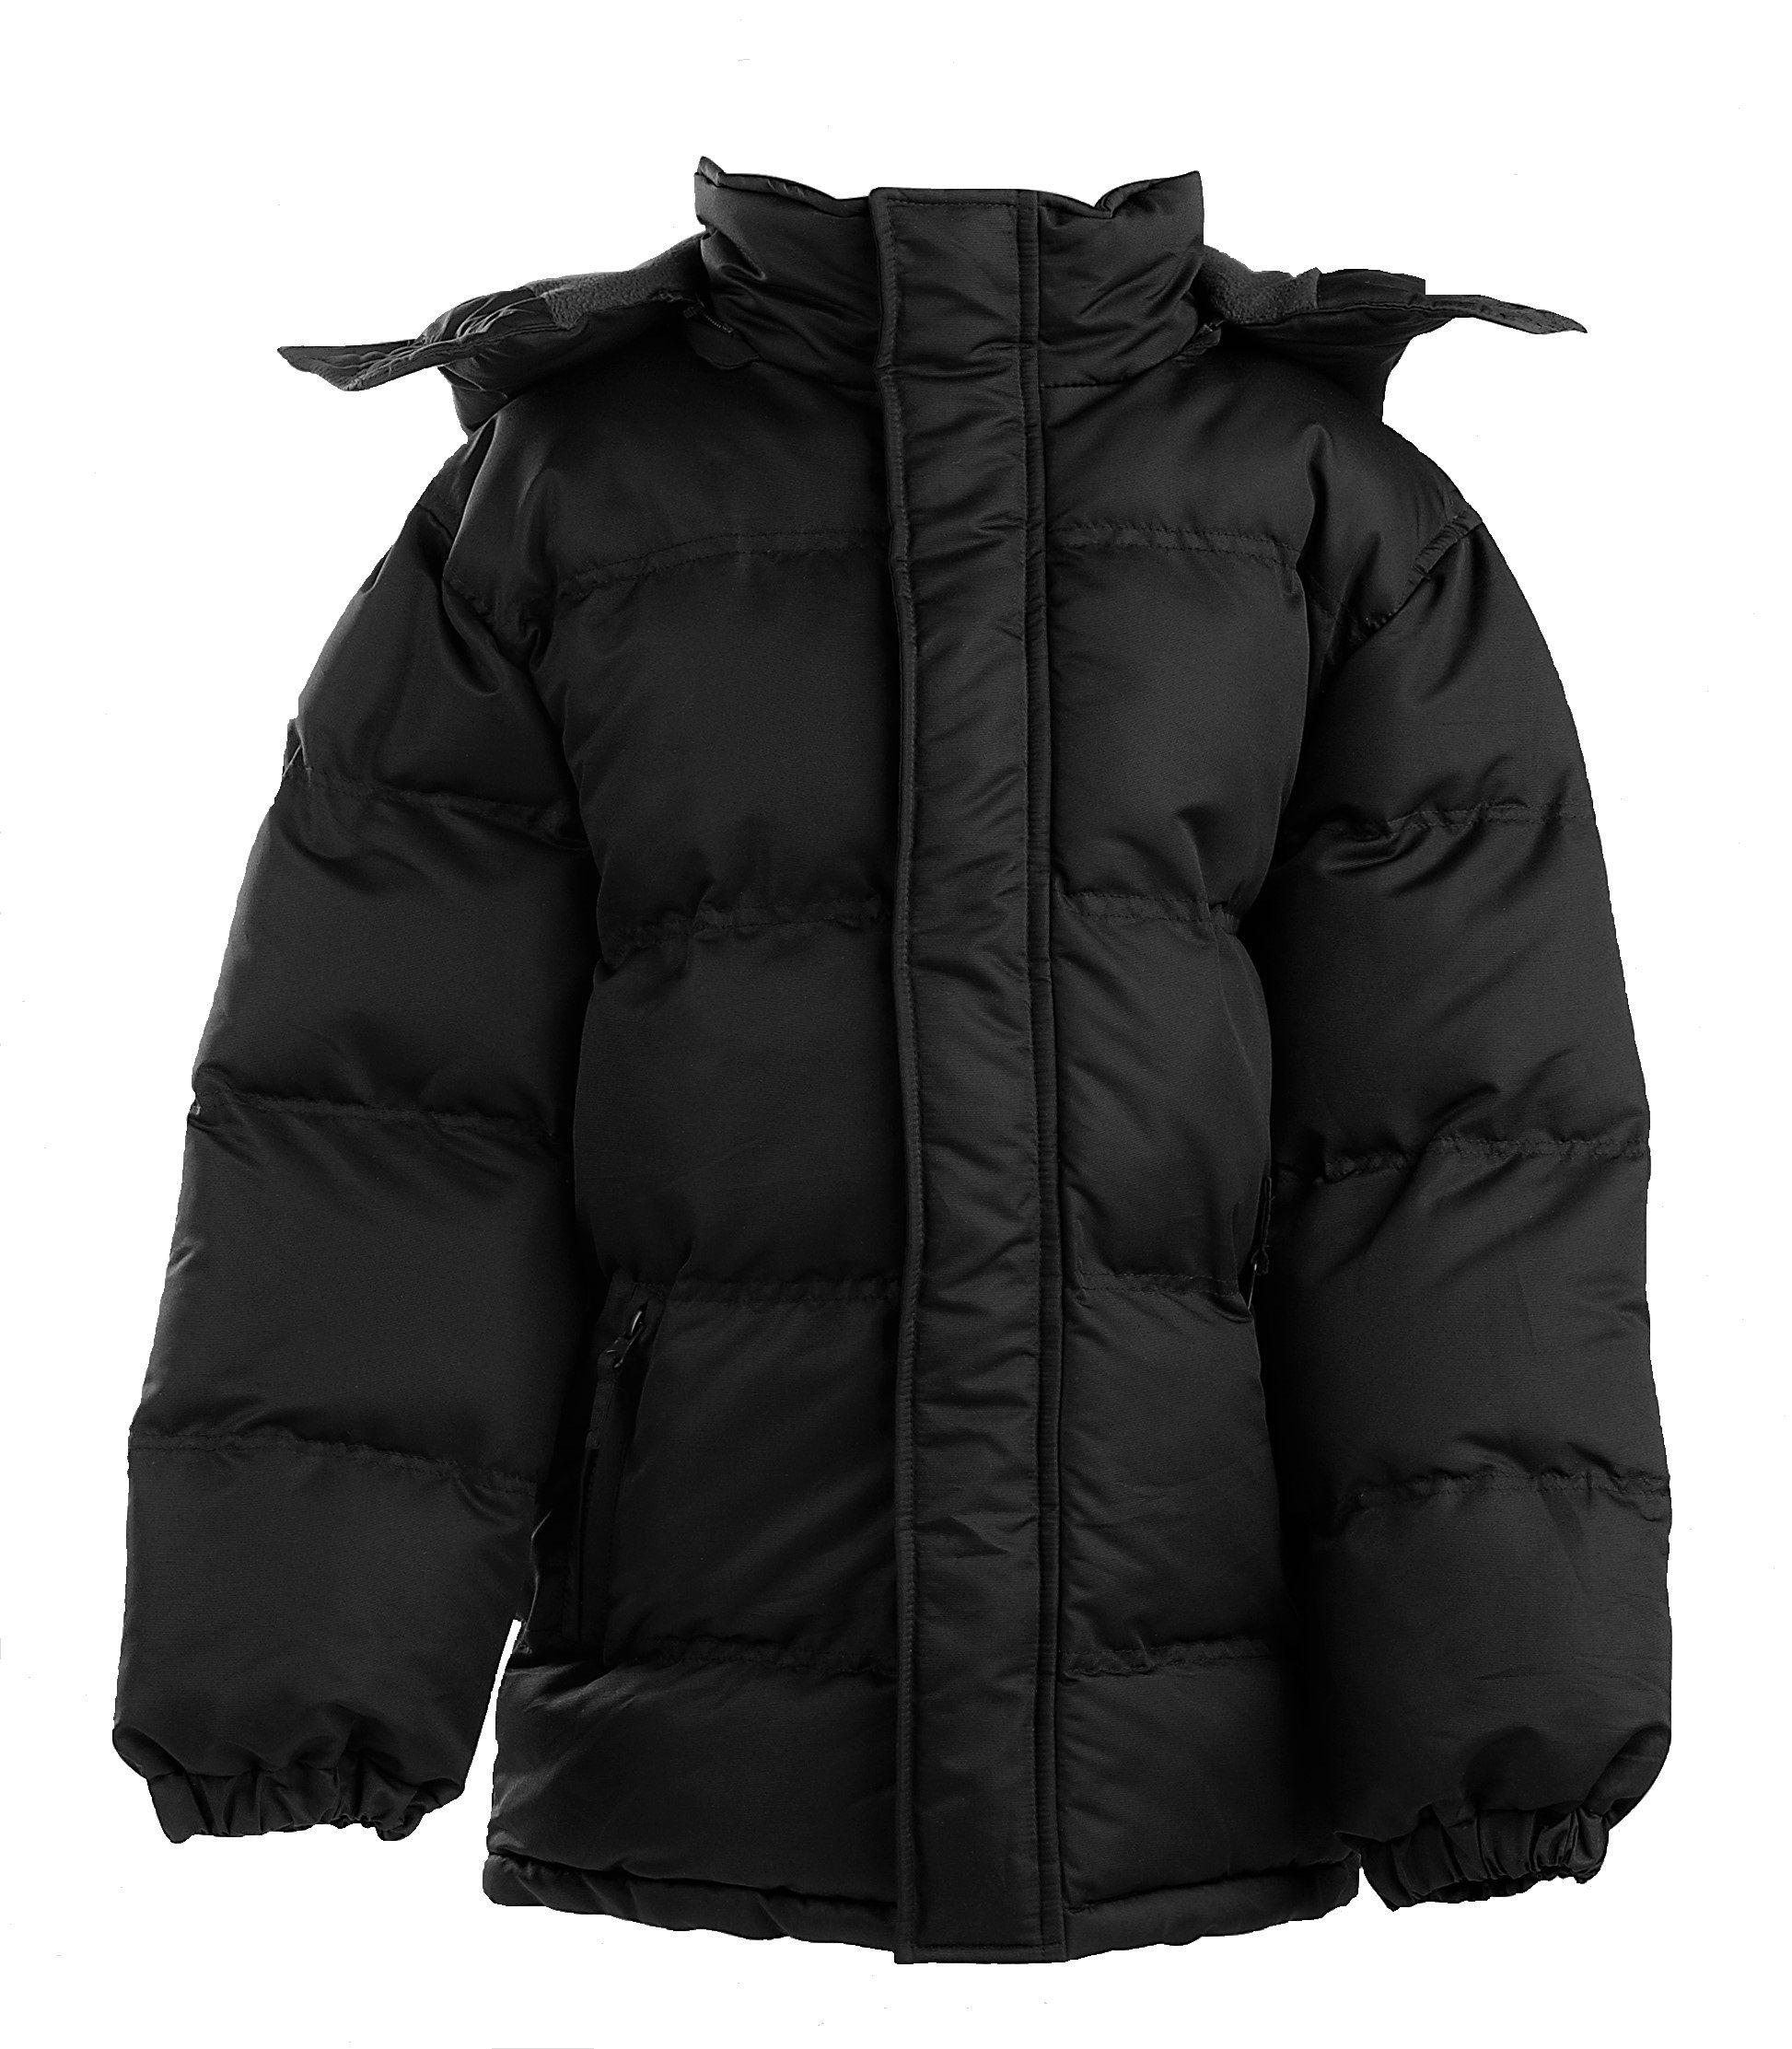 d69120b1f5c8 The Polar Club Boys  Heavy Puffer Jacket Bubble Winter Coat with ...